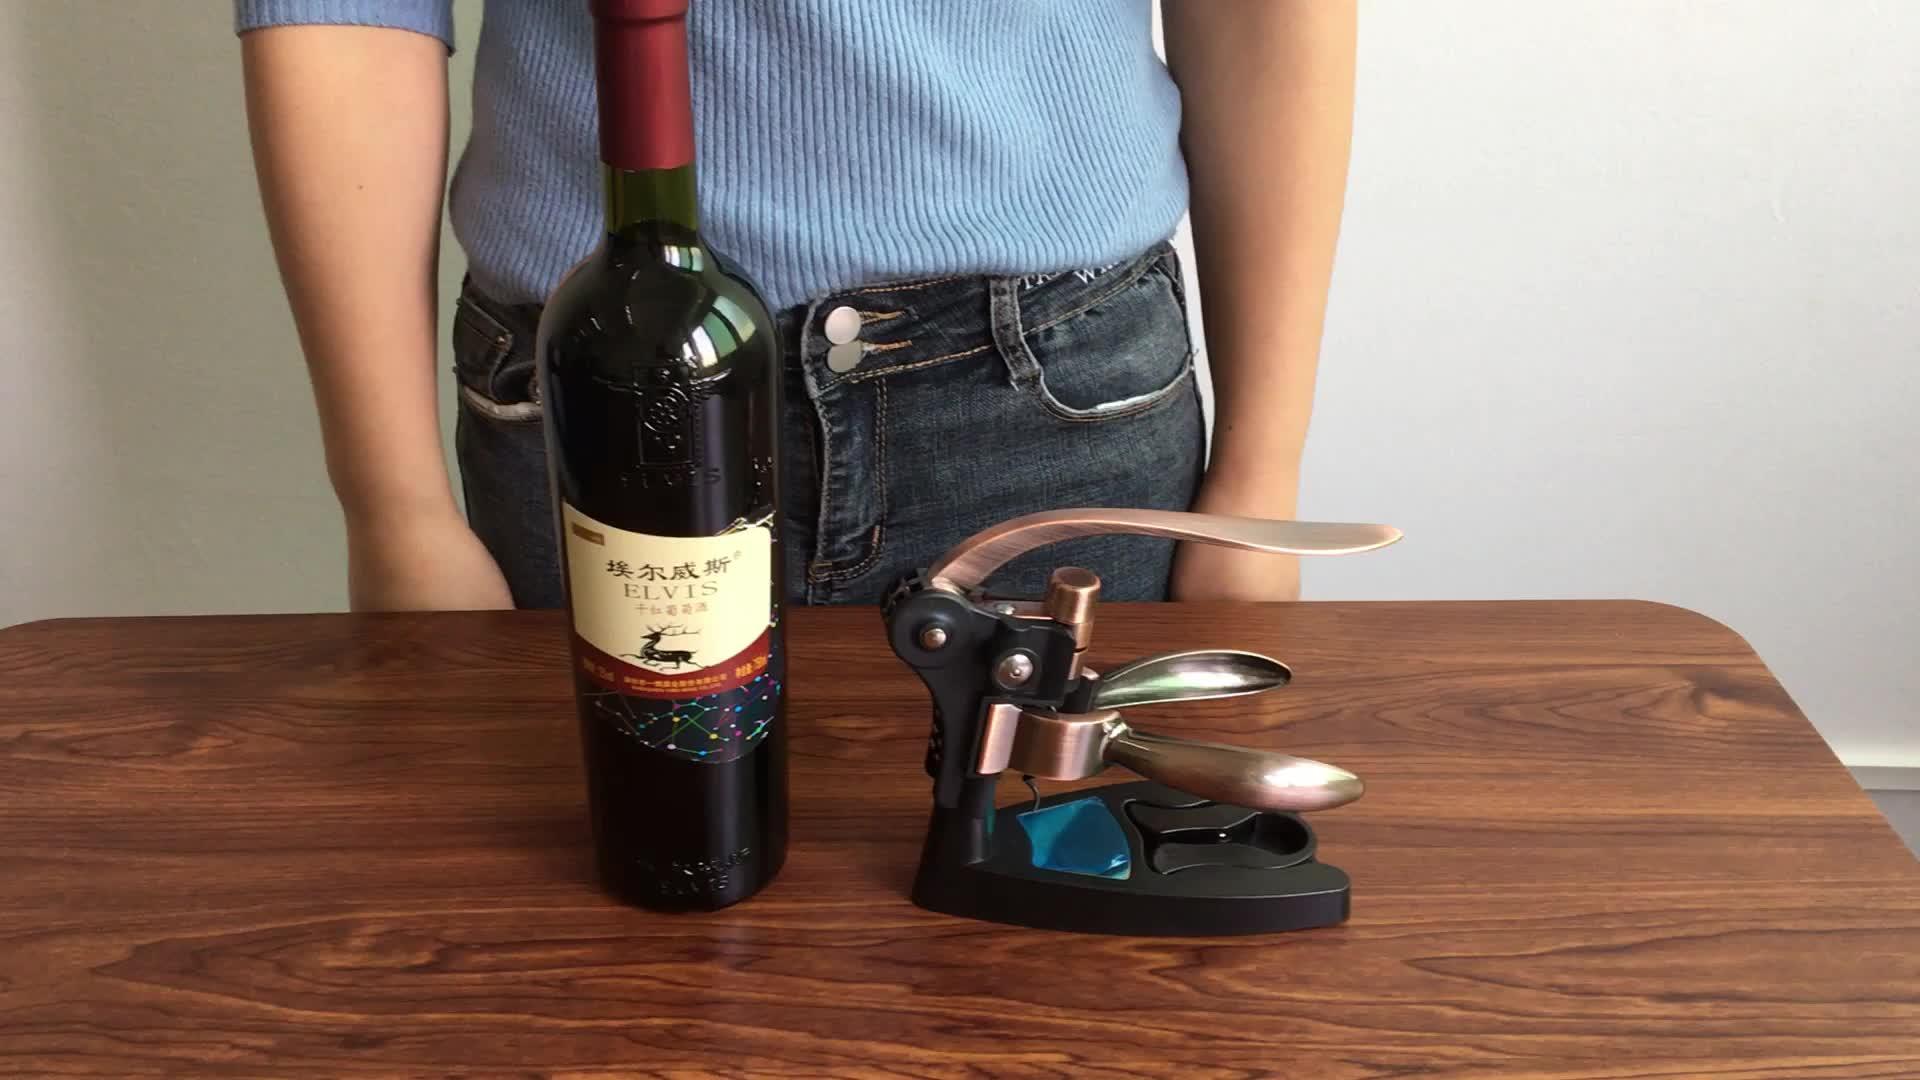 Deluxe 9 Pieces Wooden Box Wine Corkscrew Set Wine Accessory Rabbit Wine Opener Set